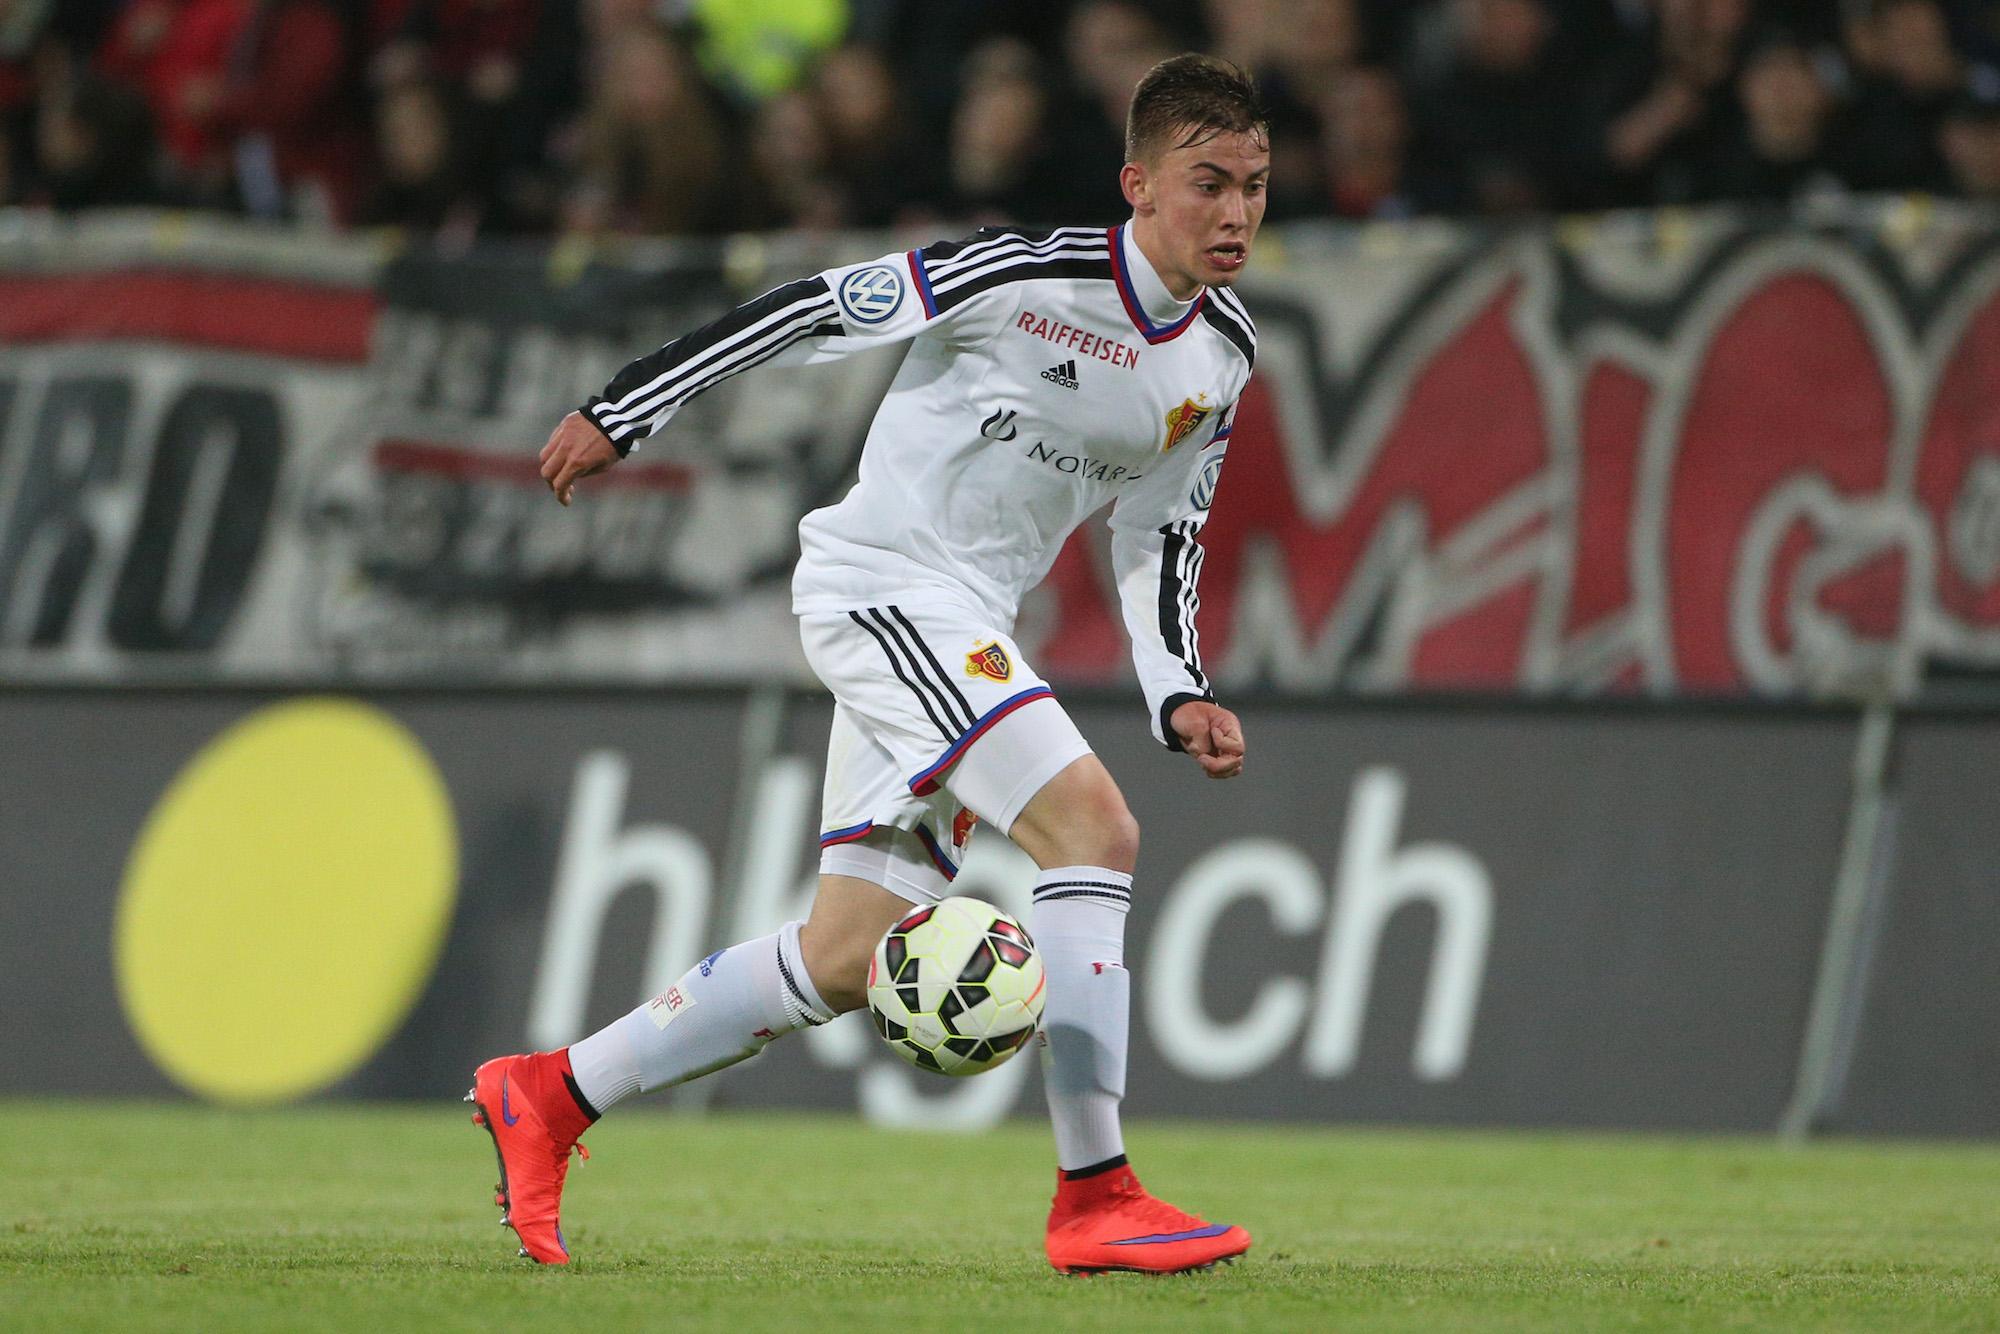 Aarau, 20.05.2015, Fussball Super League - FC Aarau - FC Basel, Robin Huser (FCB). (Marc Schumacher/EQ Images)